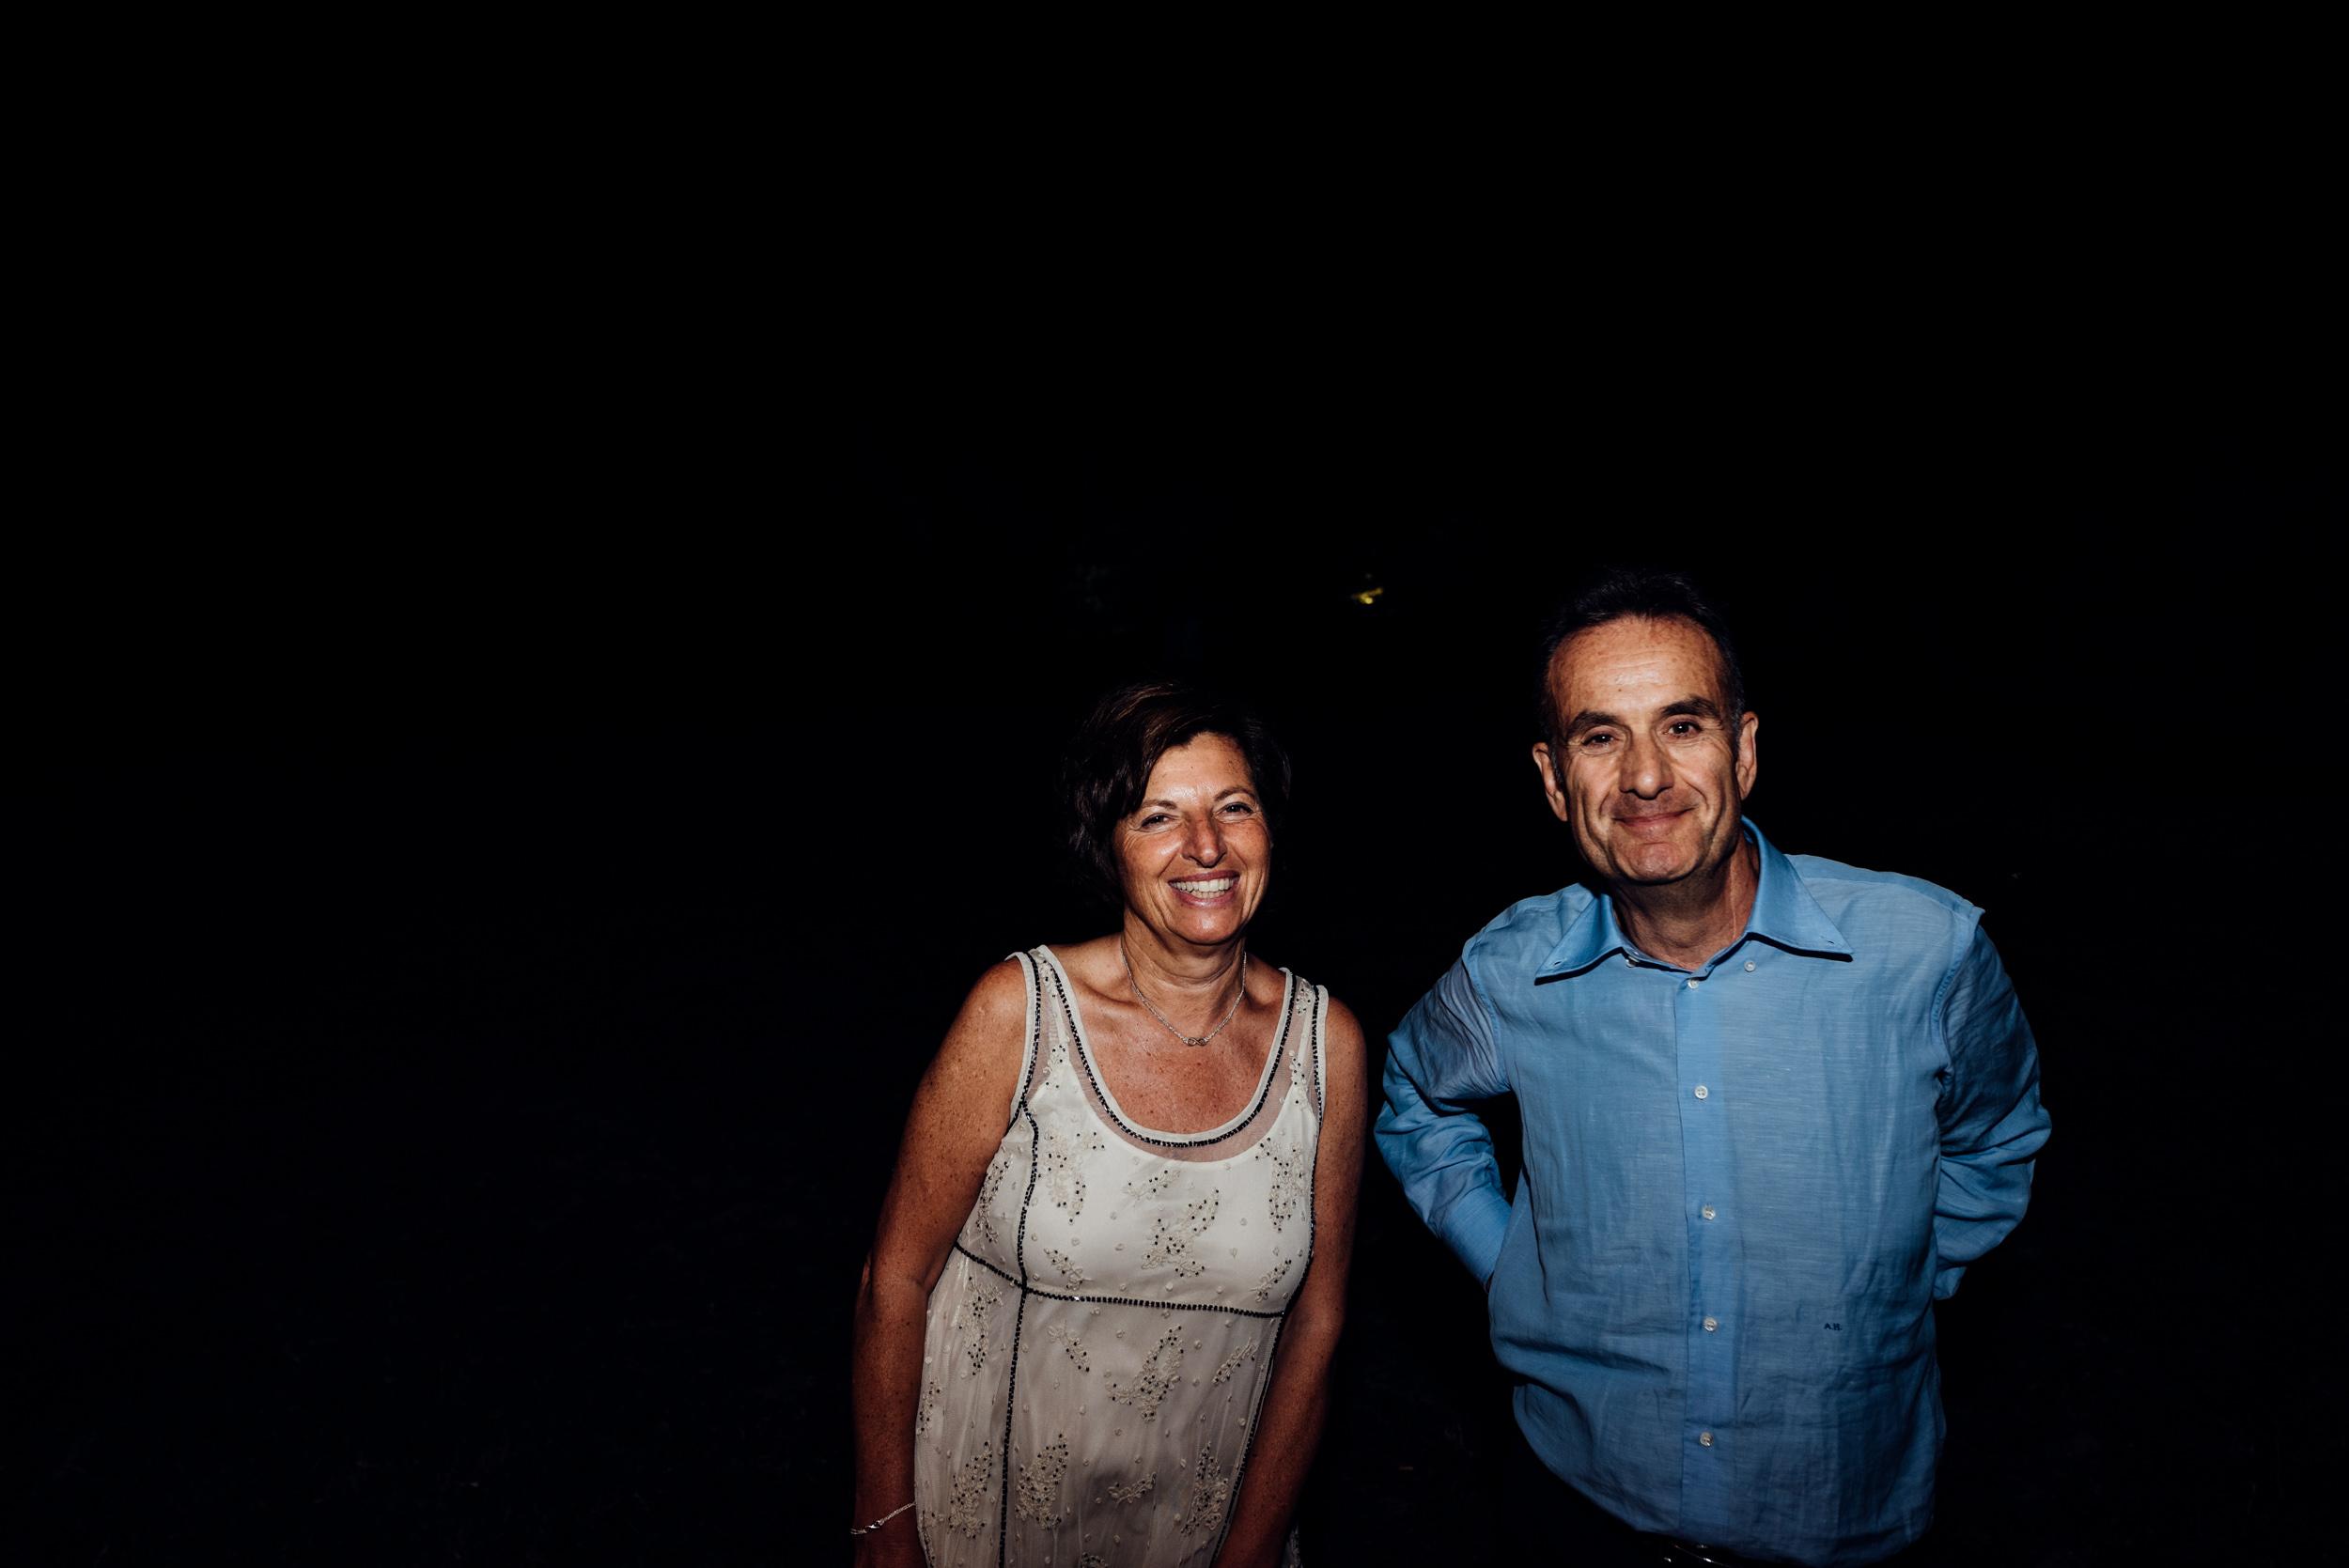 elena e paolo-253.jpg